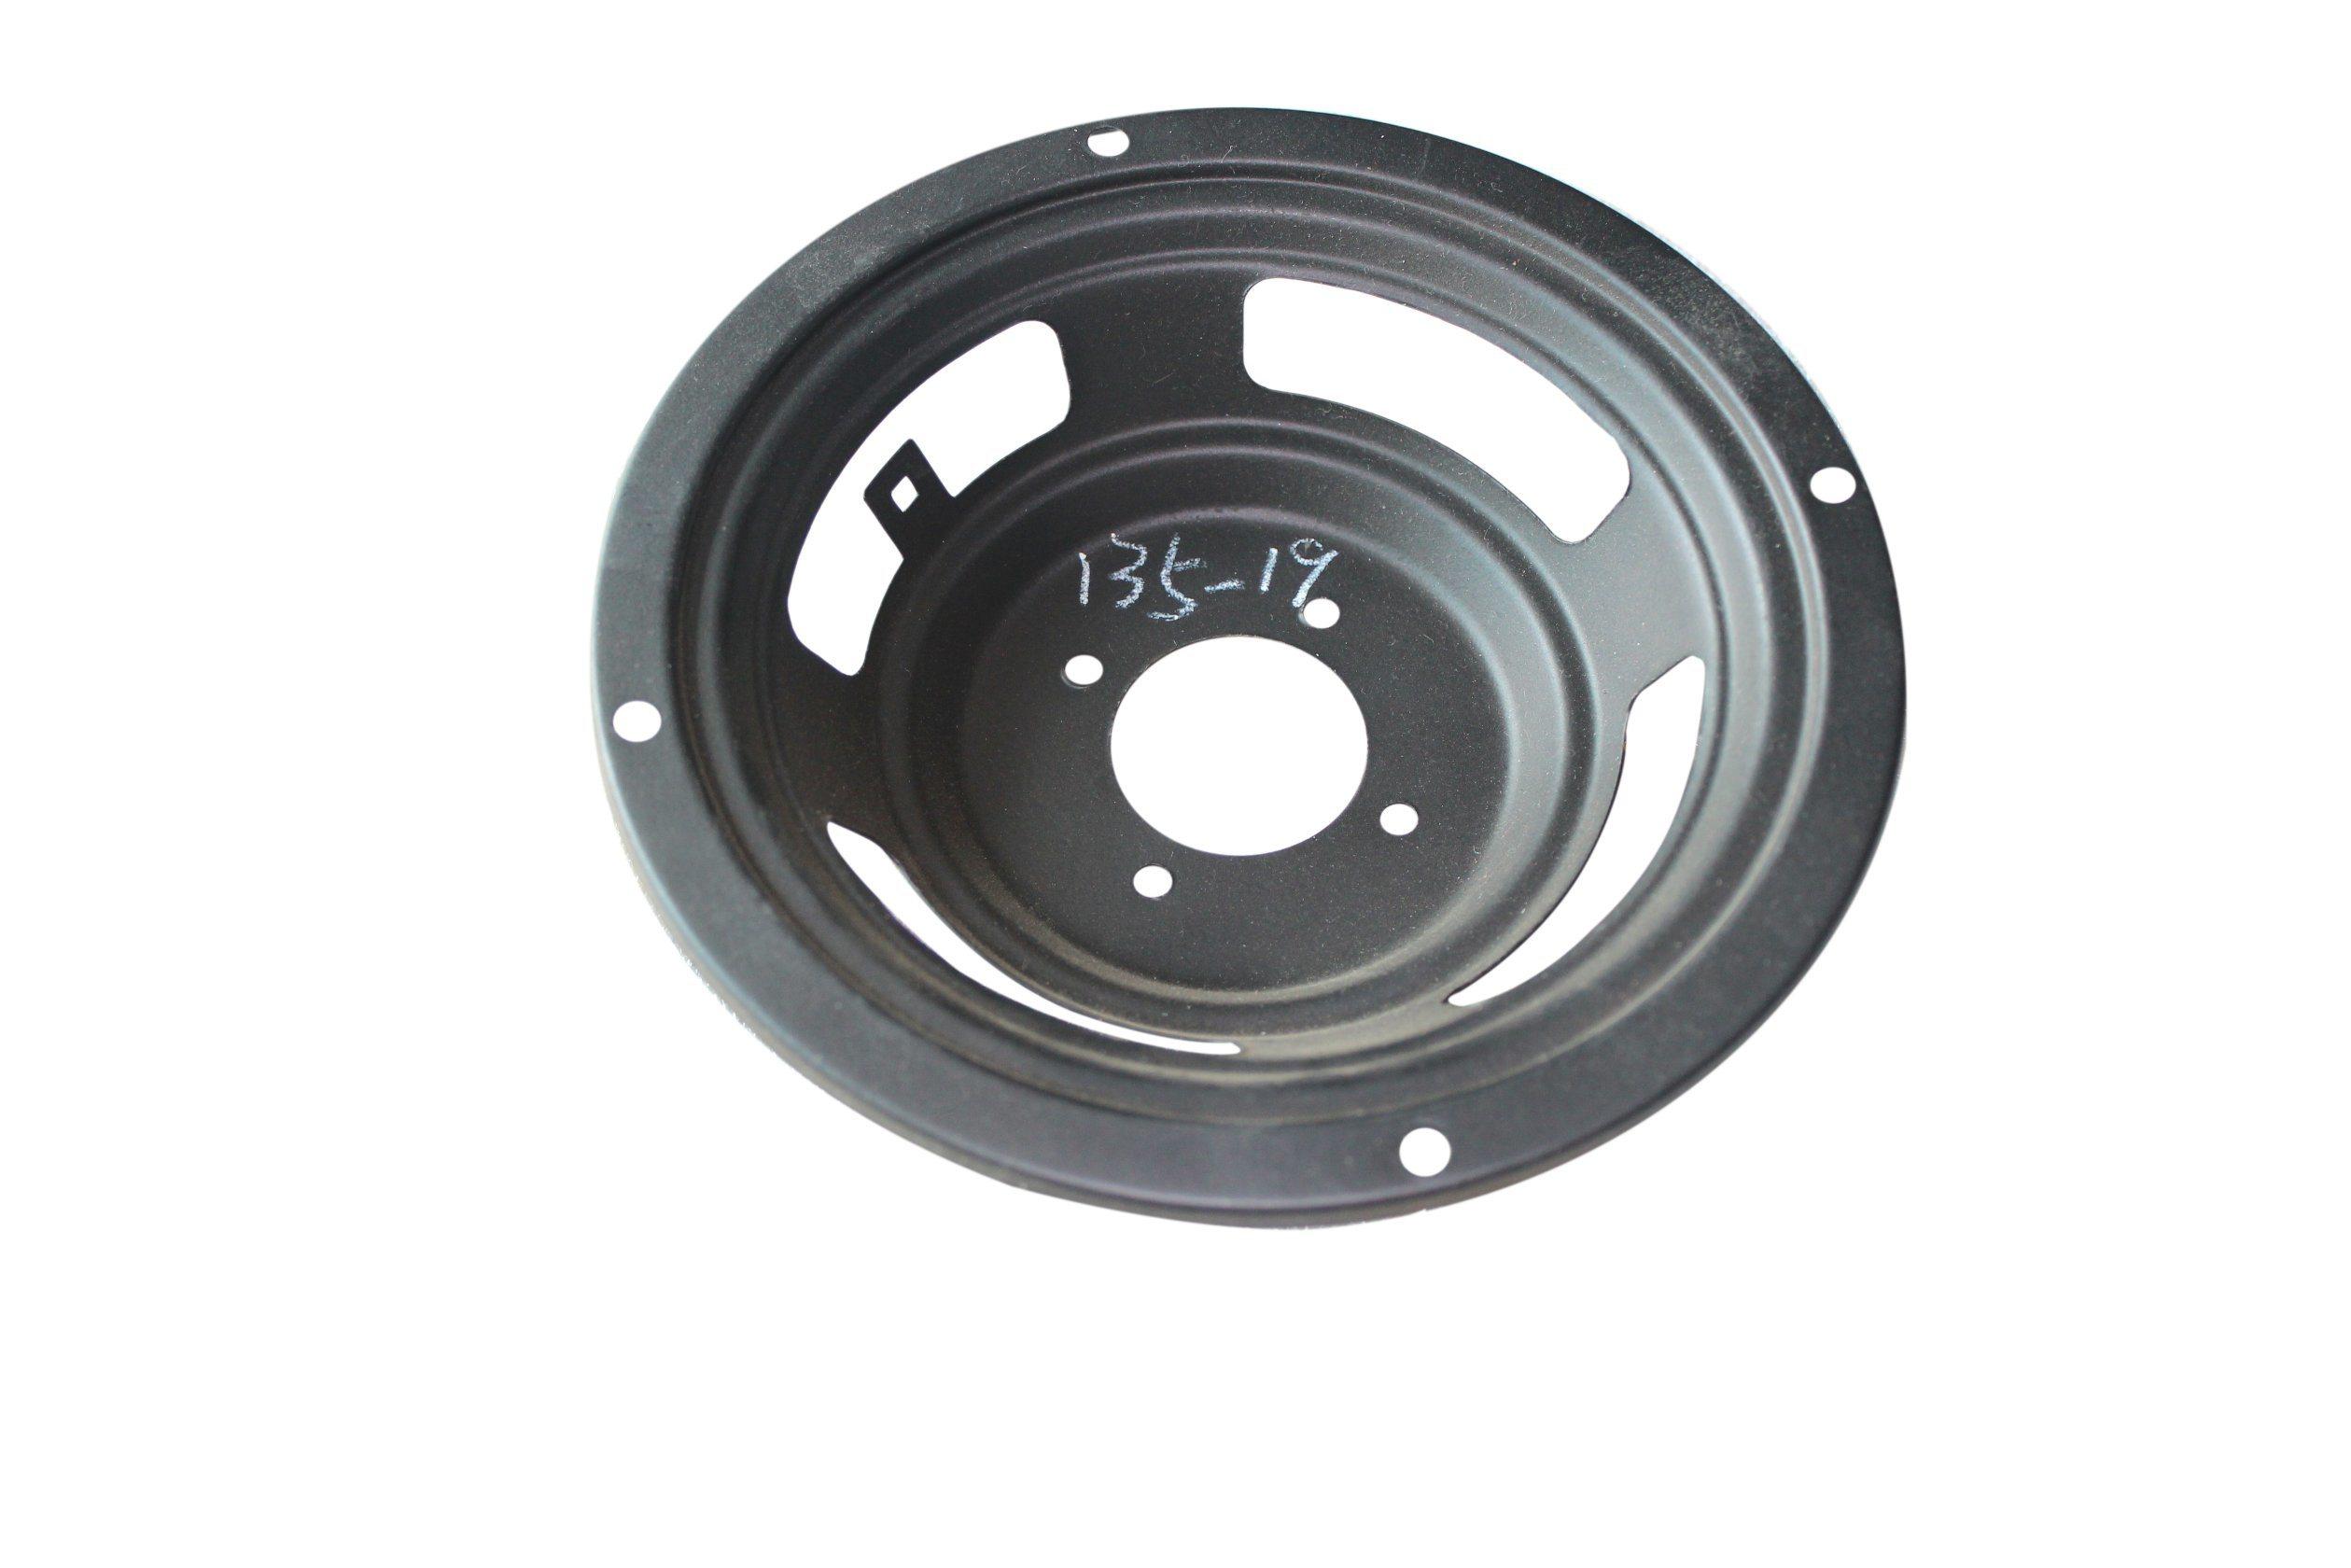 New Design High Quality 5inch Die Cast Speaker Parts-Speaker Basket